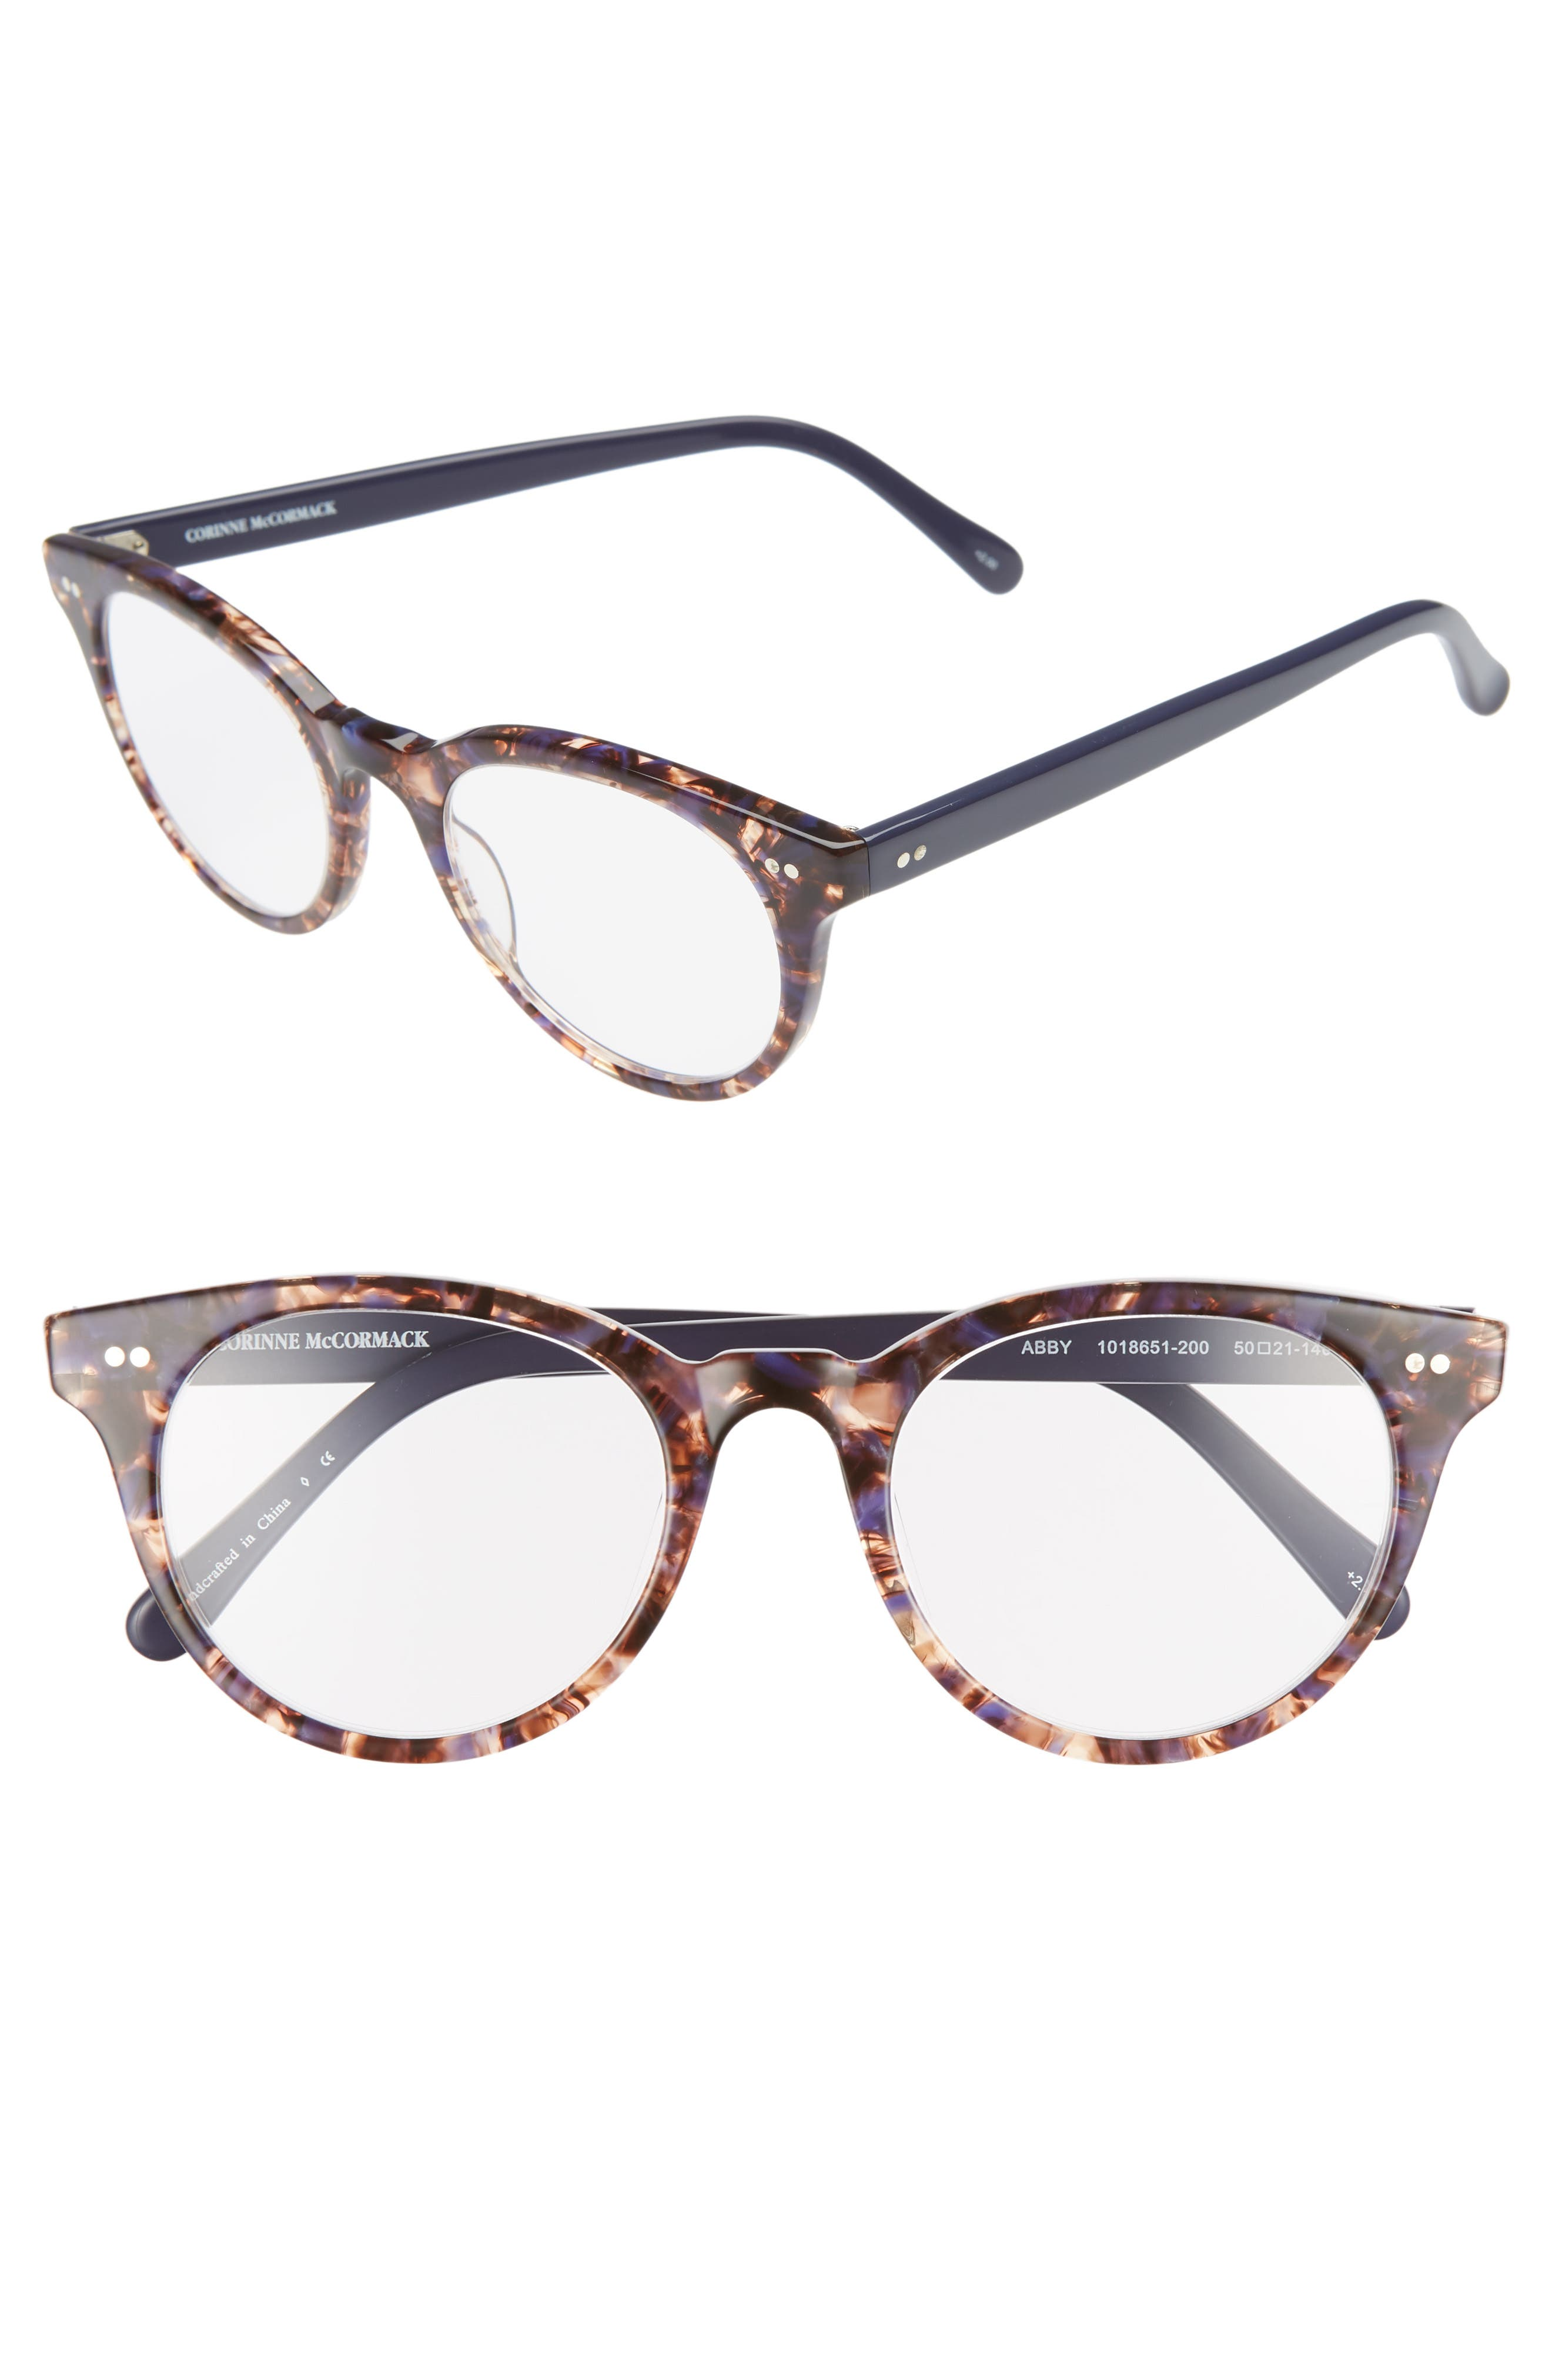 Retro Sunglasses | Vintage Glasses | New Vintage Eyeglasses Womens Corinne Mccormack Abby 50Mm Reading Glasses - Tortoise Navy Blue $68.00 AT vintagedancer.com